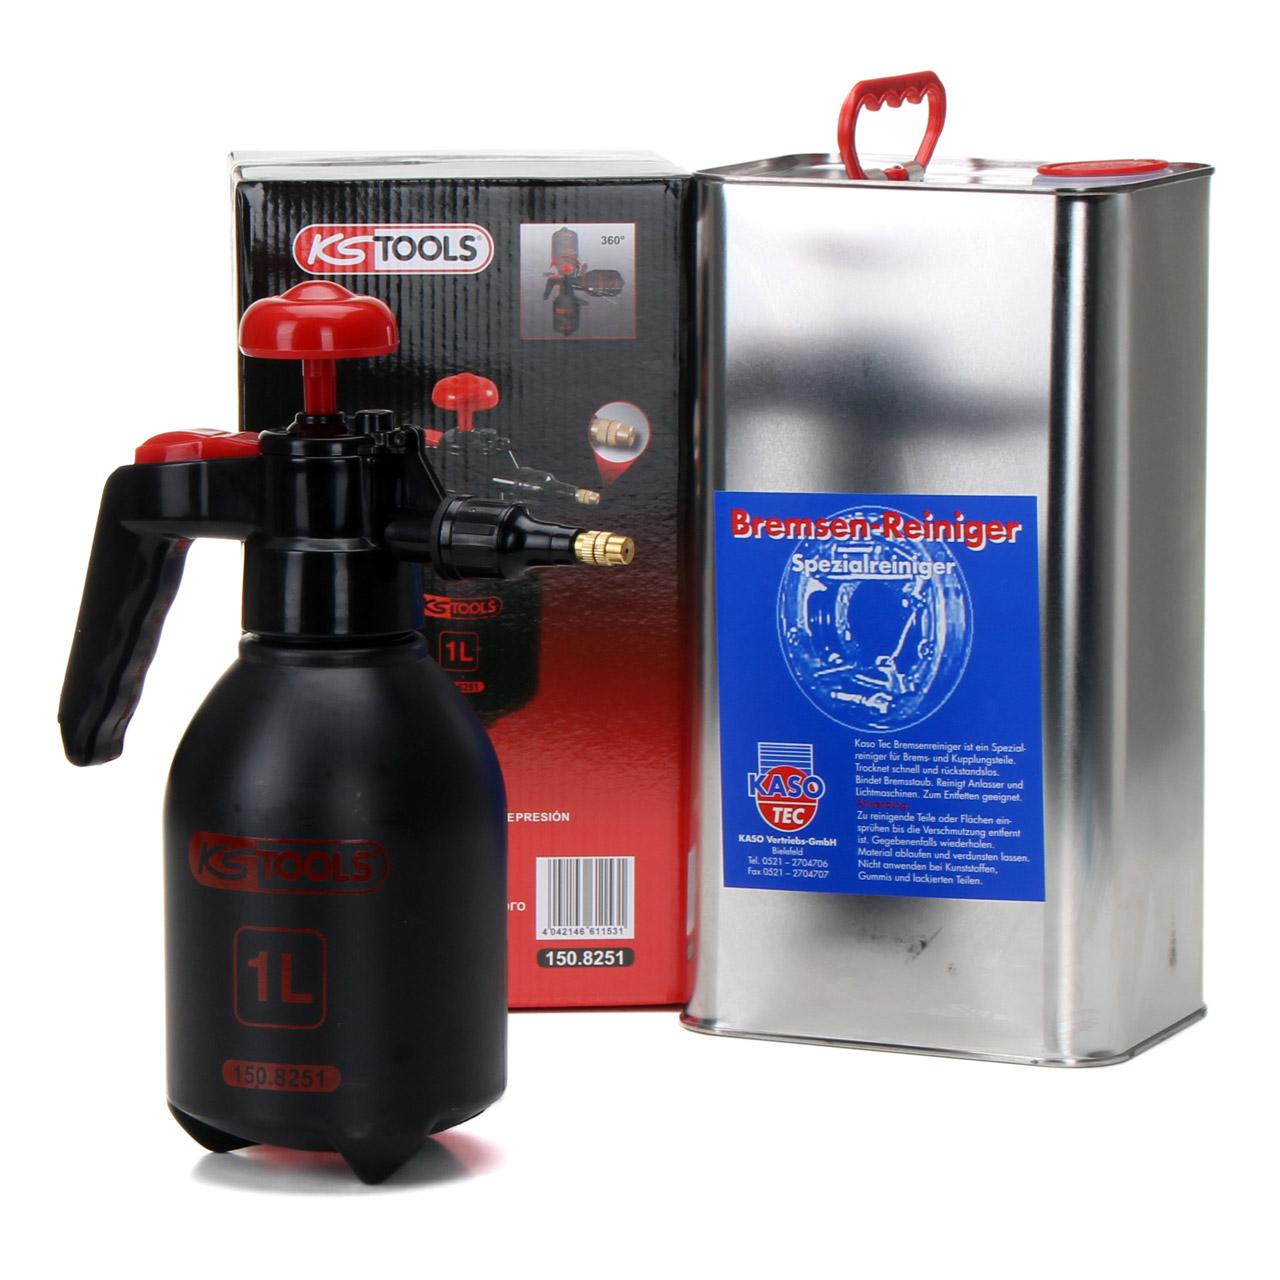 KASOTEC Bremsenreiniger Montagereiniger 5 L + KS TOOLS Druckpumpflasche 1 LITER